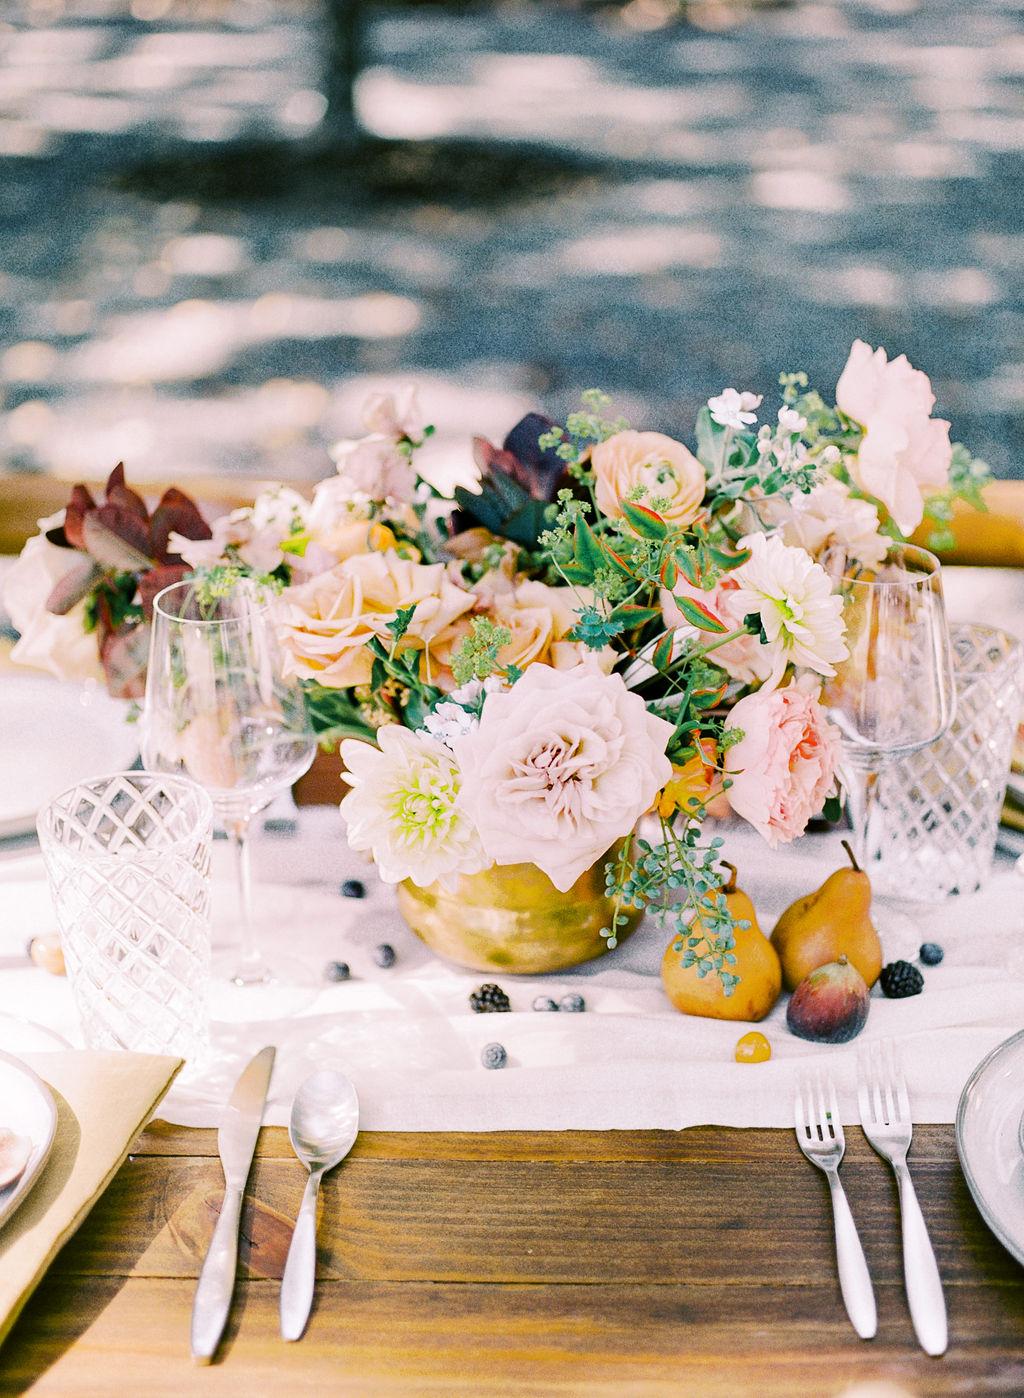 Alba Dahlia Floral Design: Ethereal Wedding Inspiration at The White Sparrow